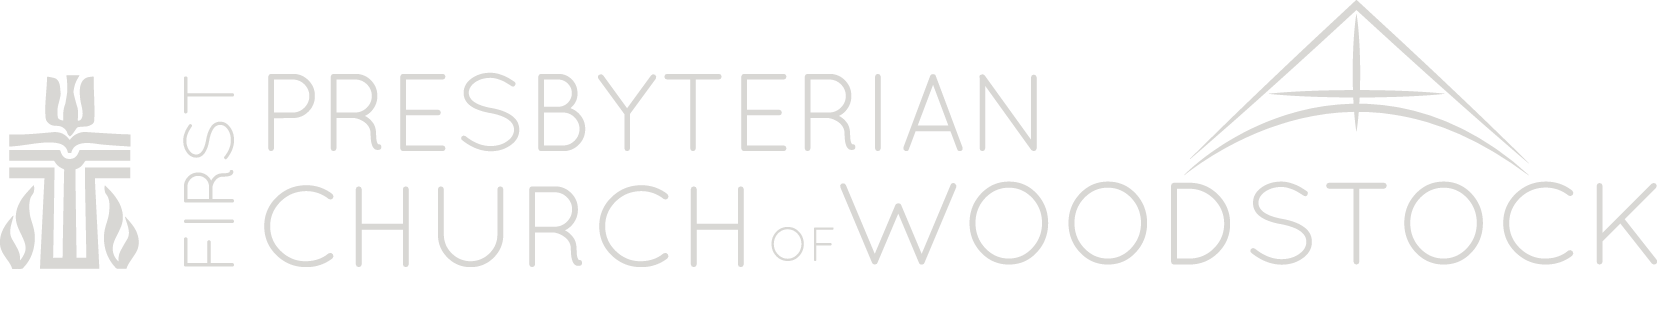 First Presbyterian Church Of Woodstock Logo